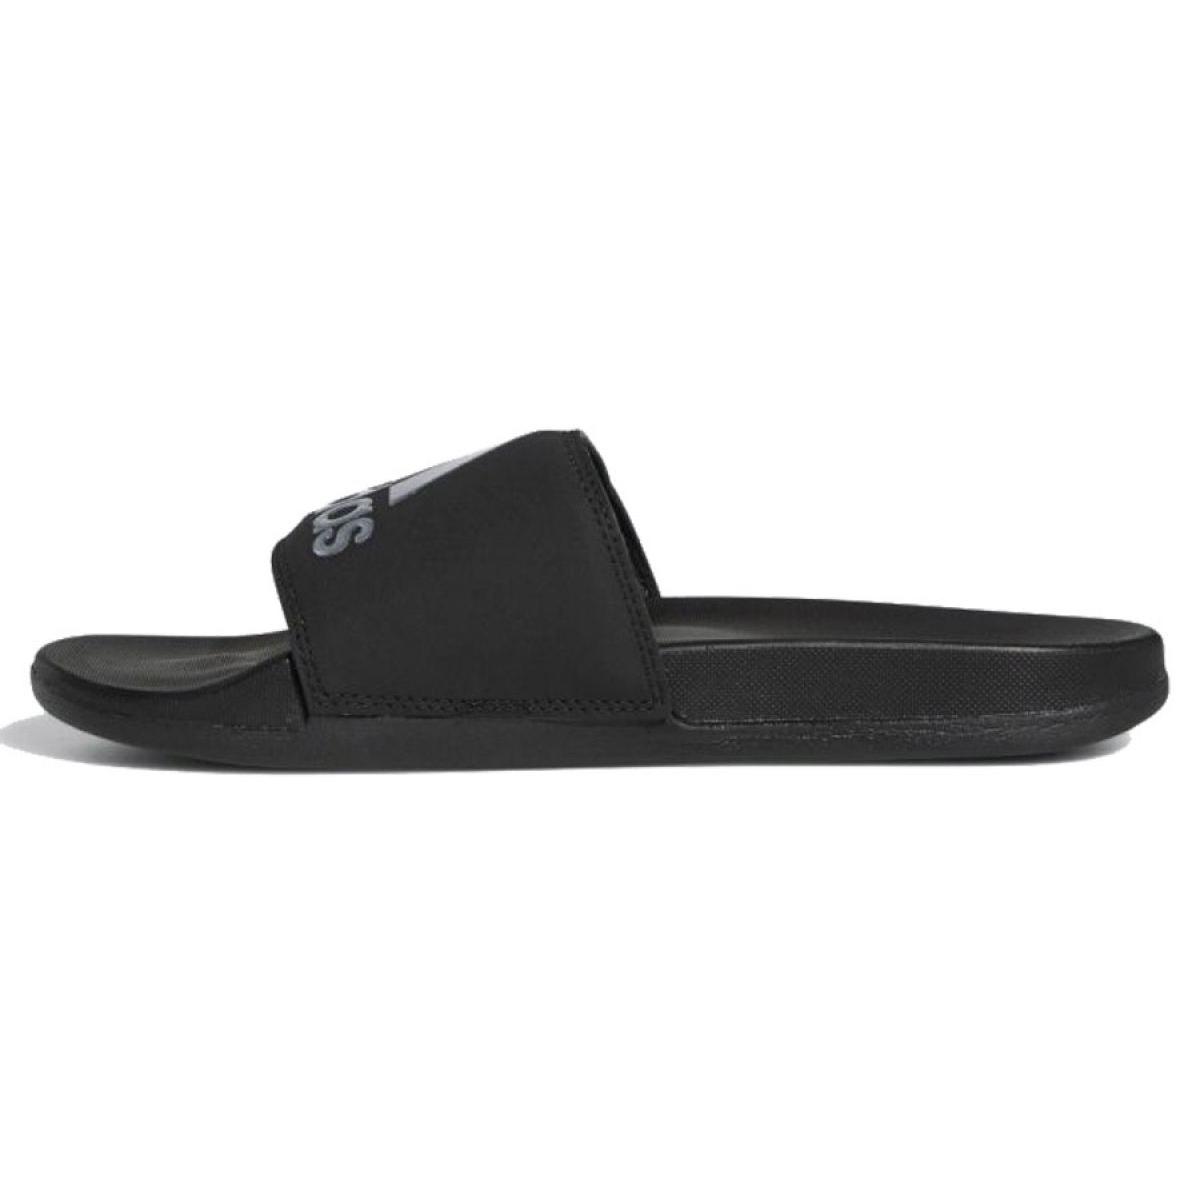 Adidas Adilette Comfort G28386 slippers